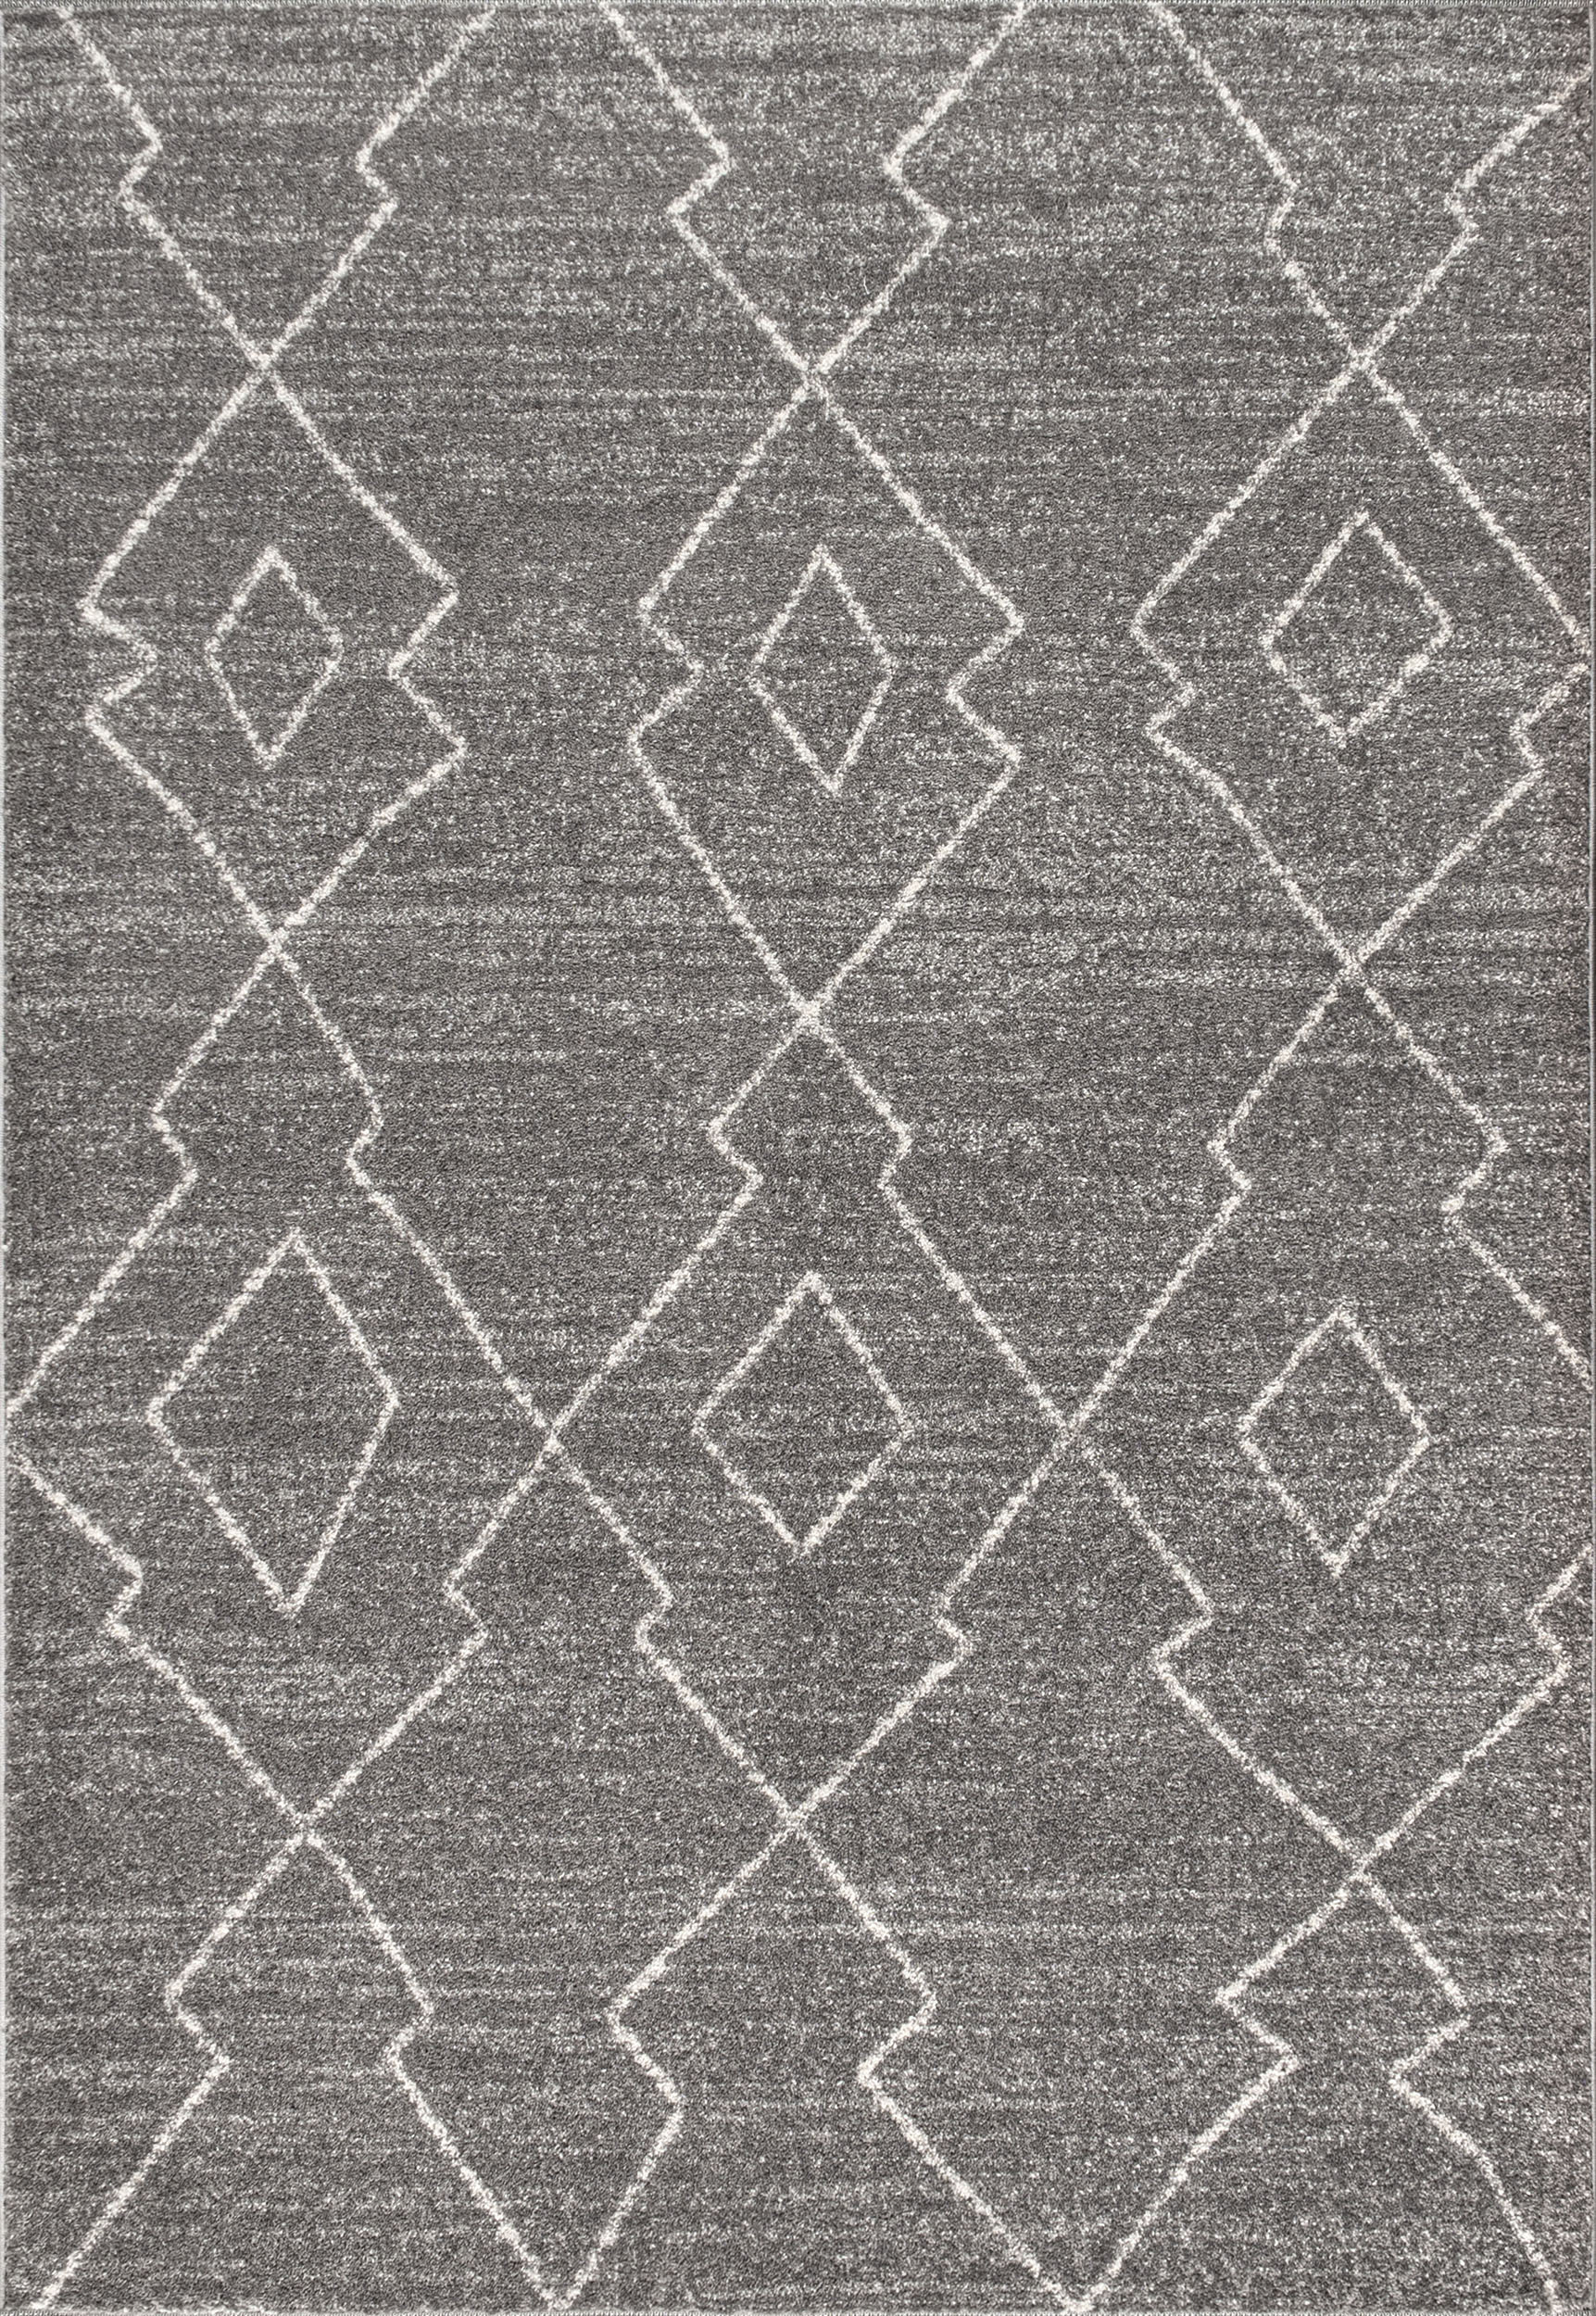 Alia Moroccan Beni Souk Gray/Cream 5 ft. x 8 ft. Area Rug